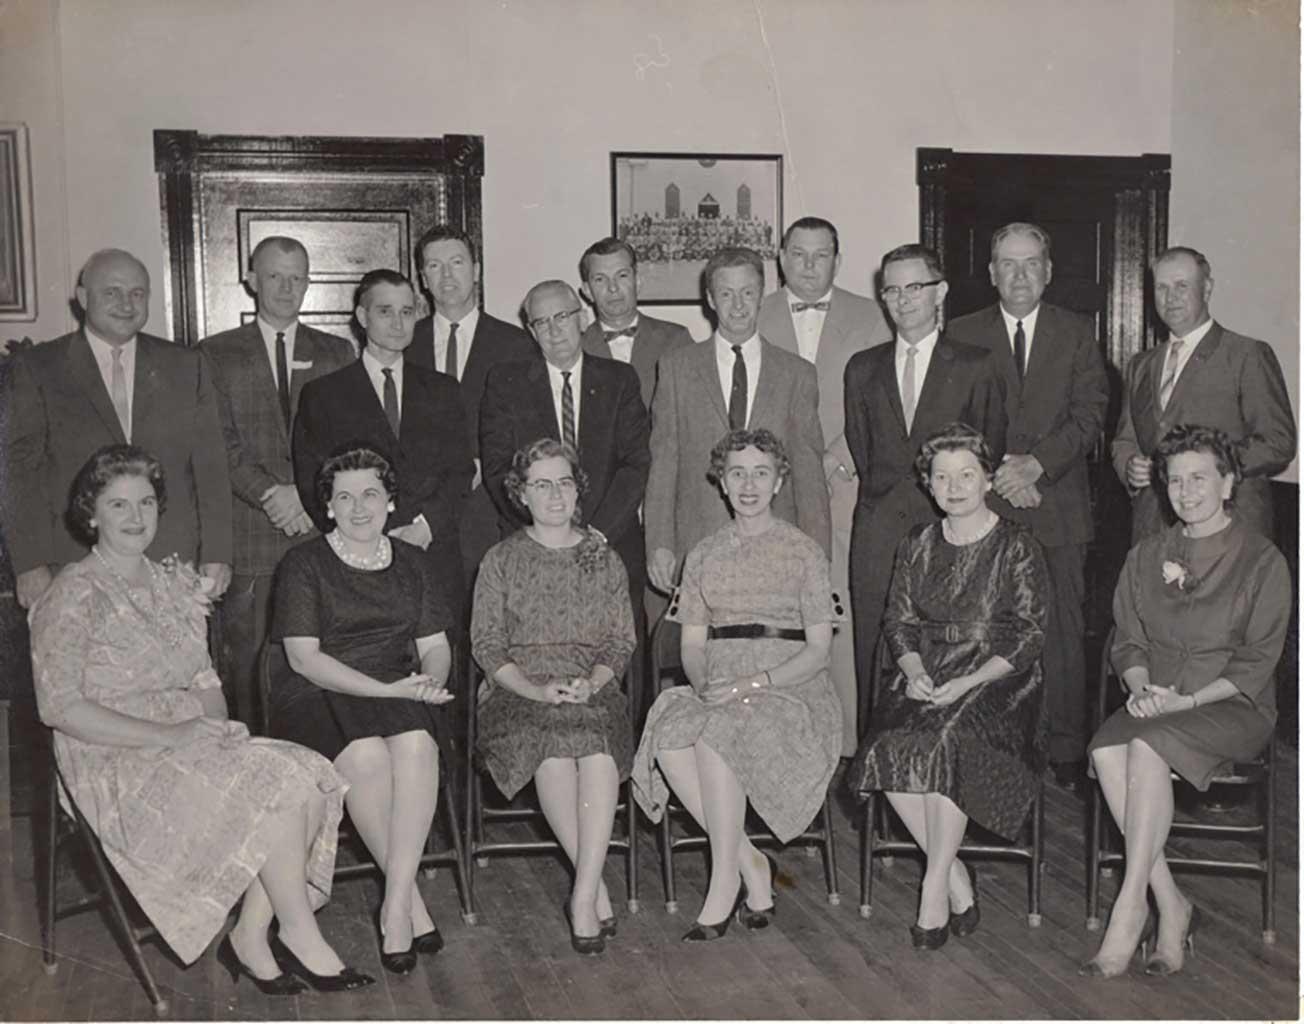 CHS of 1937 reunion